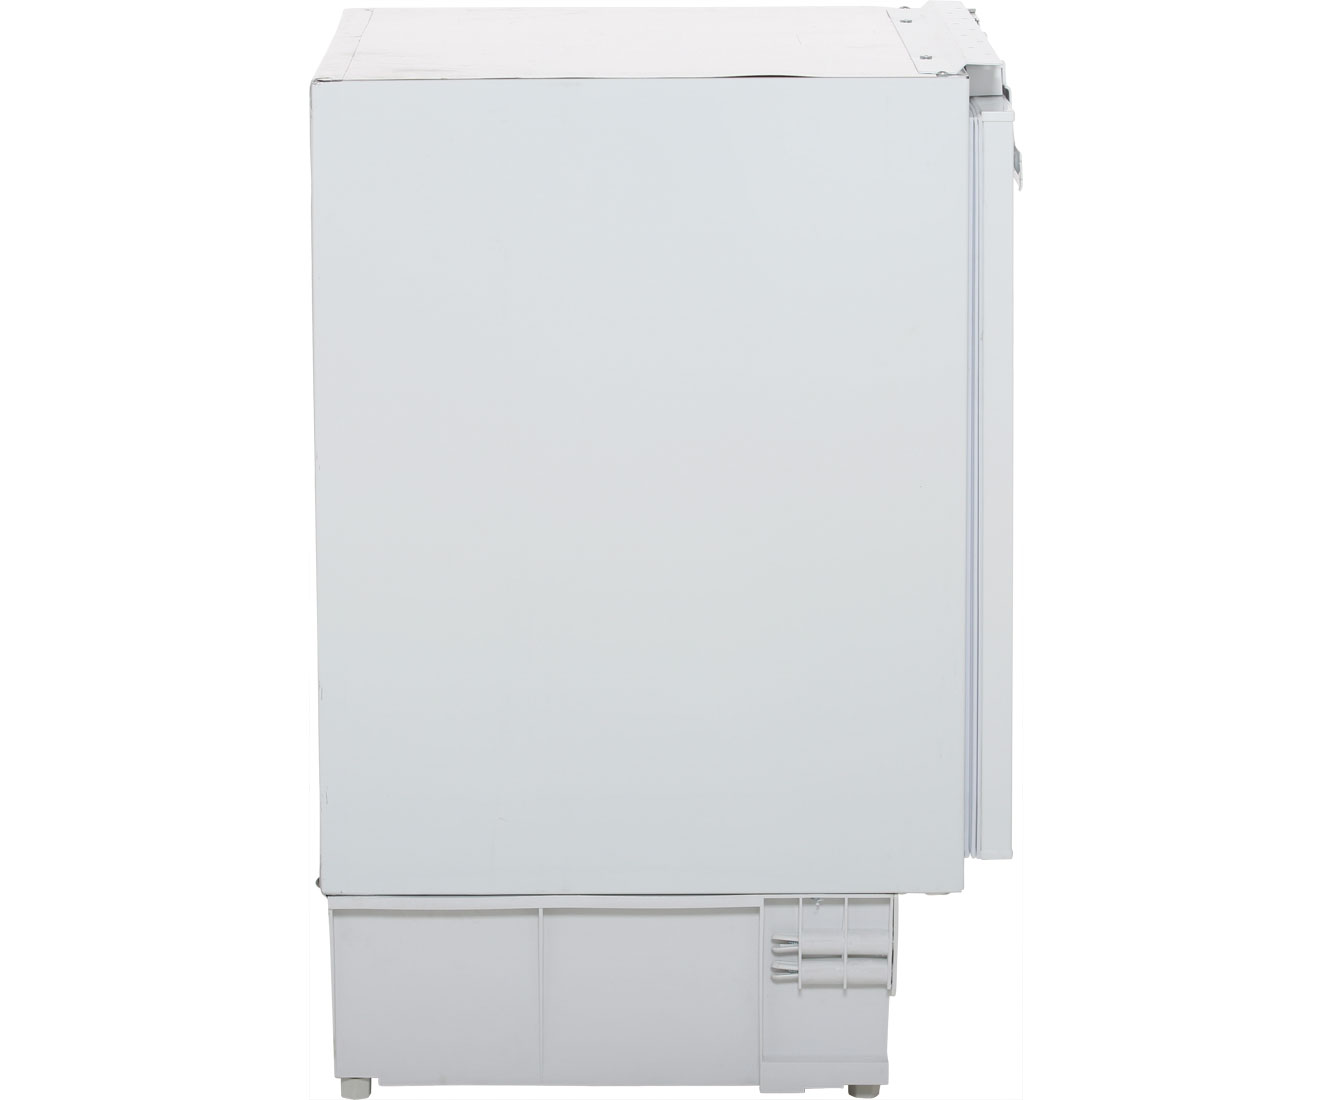 Amica Kühlschrank : Kühlschrank unterbau aeg sks f unterbau kühlschrank festtür